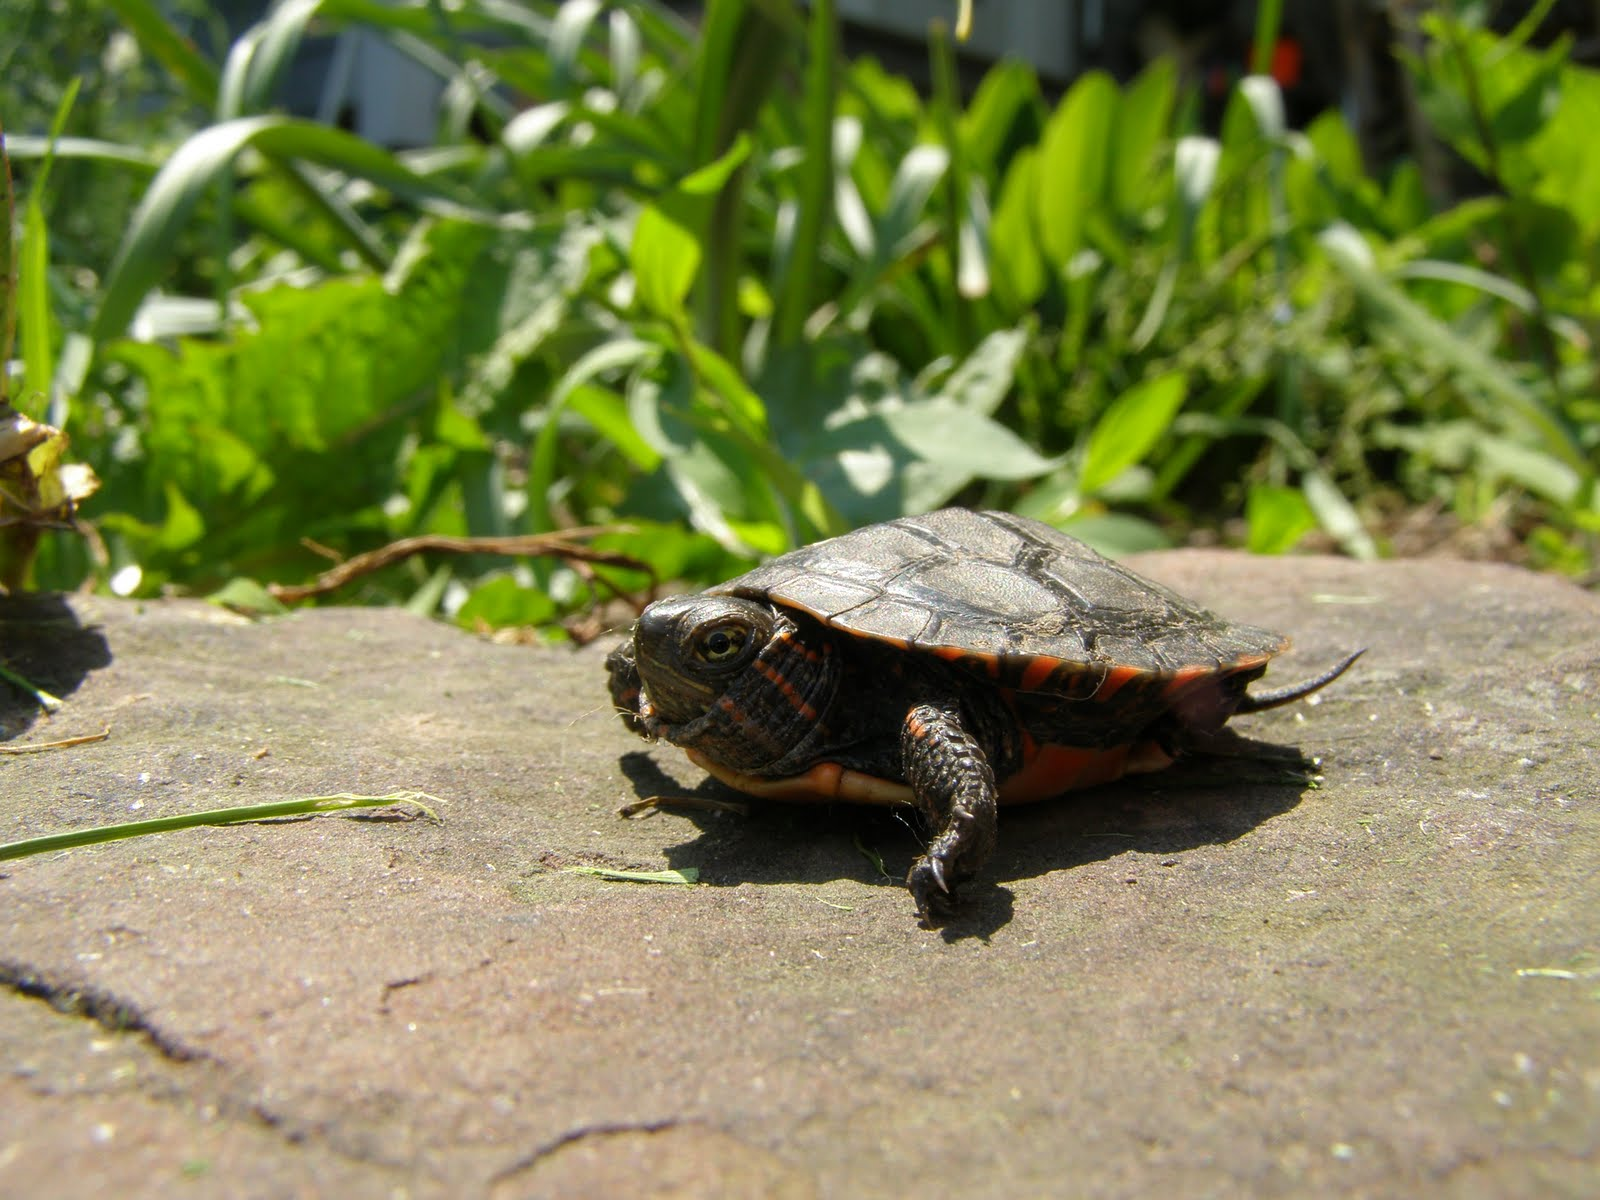 Turtle funny - photo#48